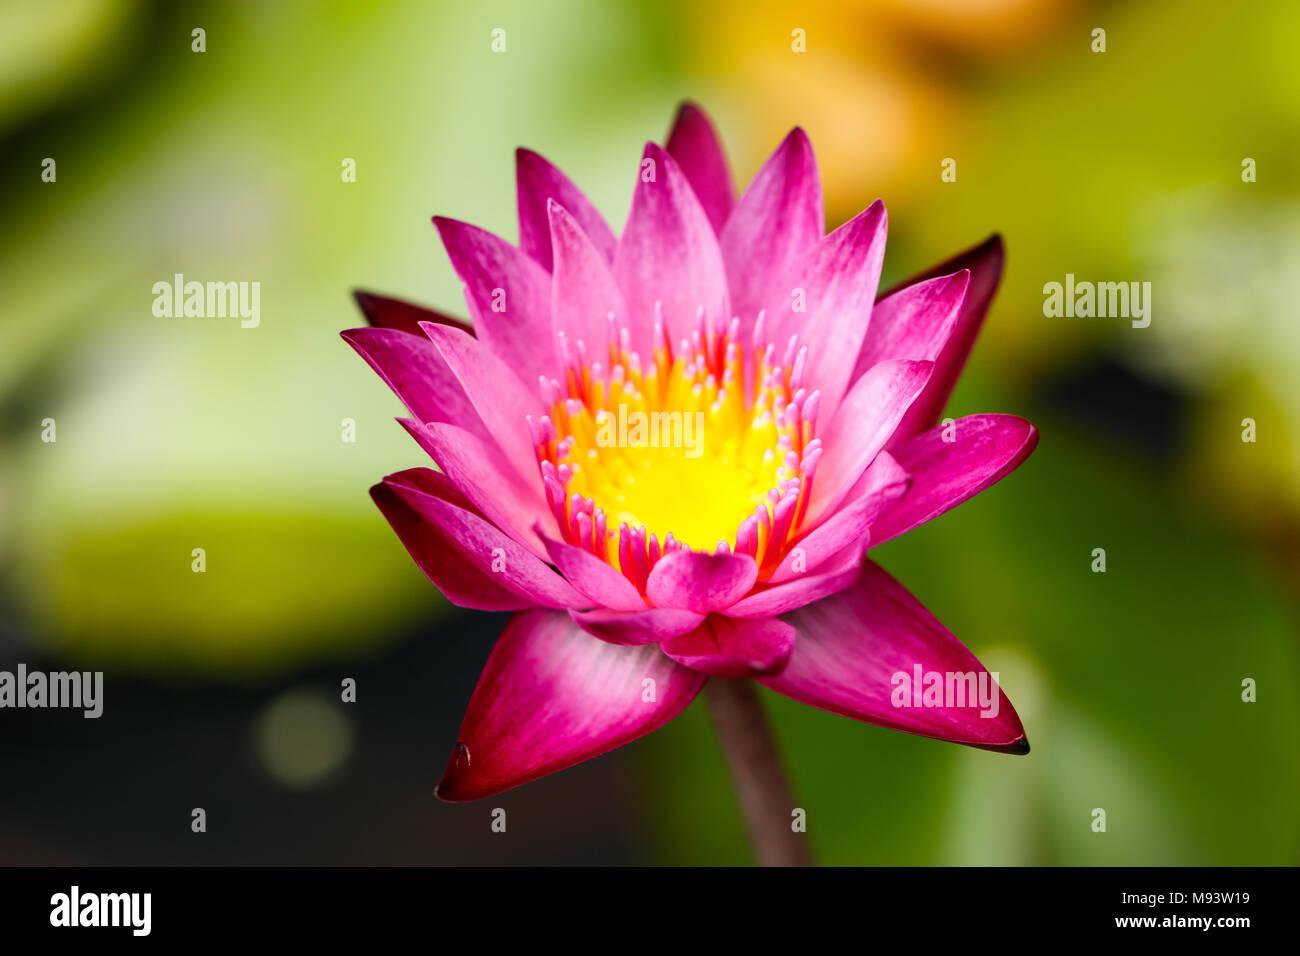 Big lotus leaf stock photos big lotus leaf stock images page 3 pink lotus flowers growing upright stock image mightylinksfo